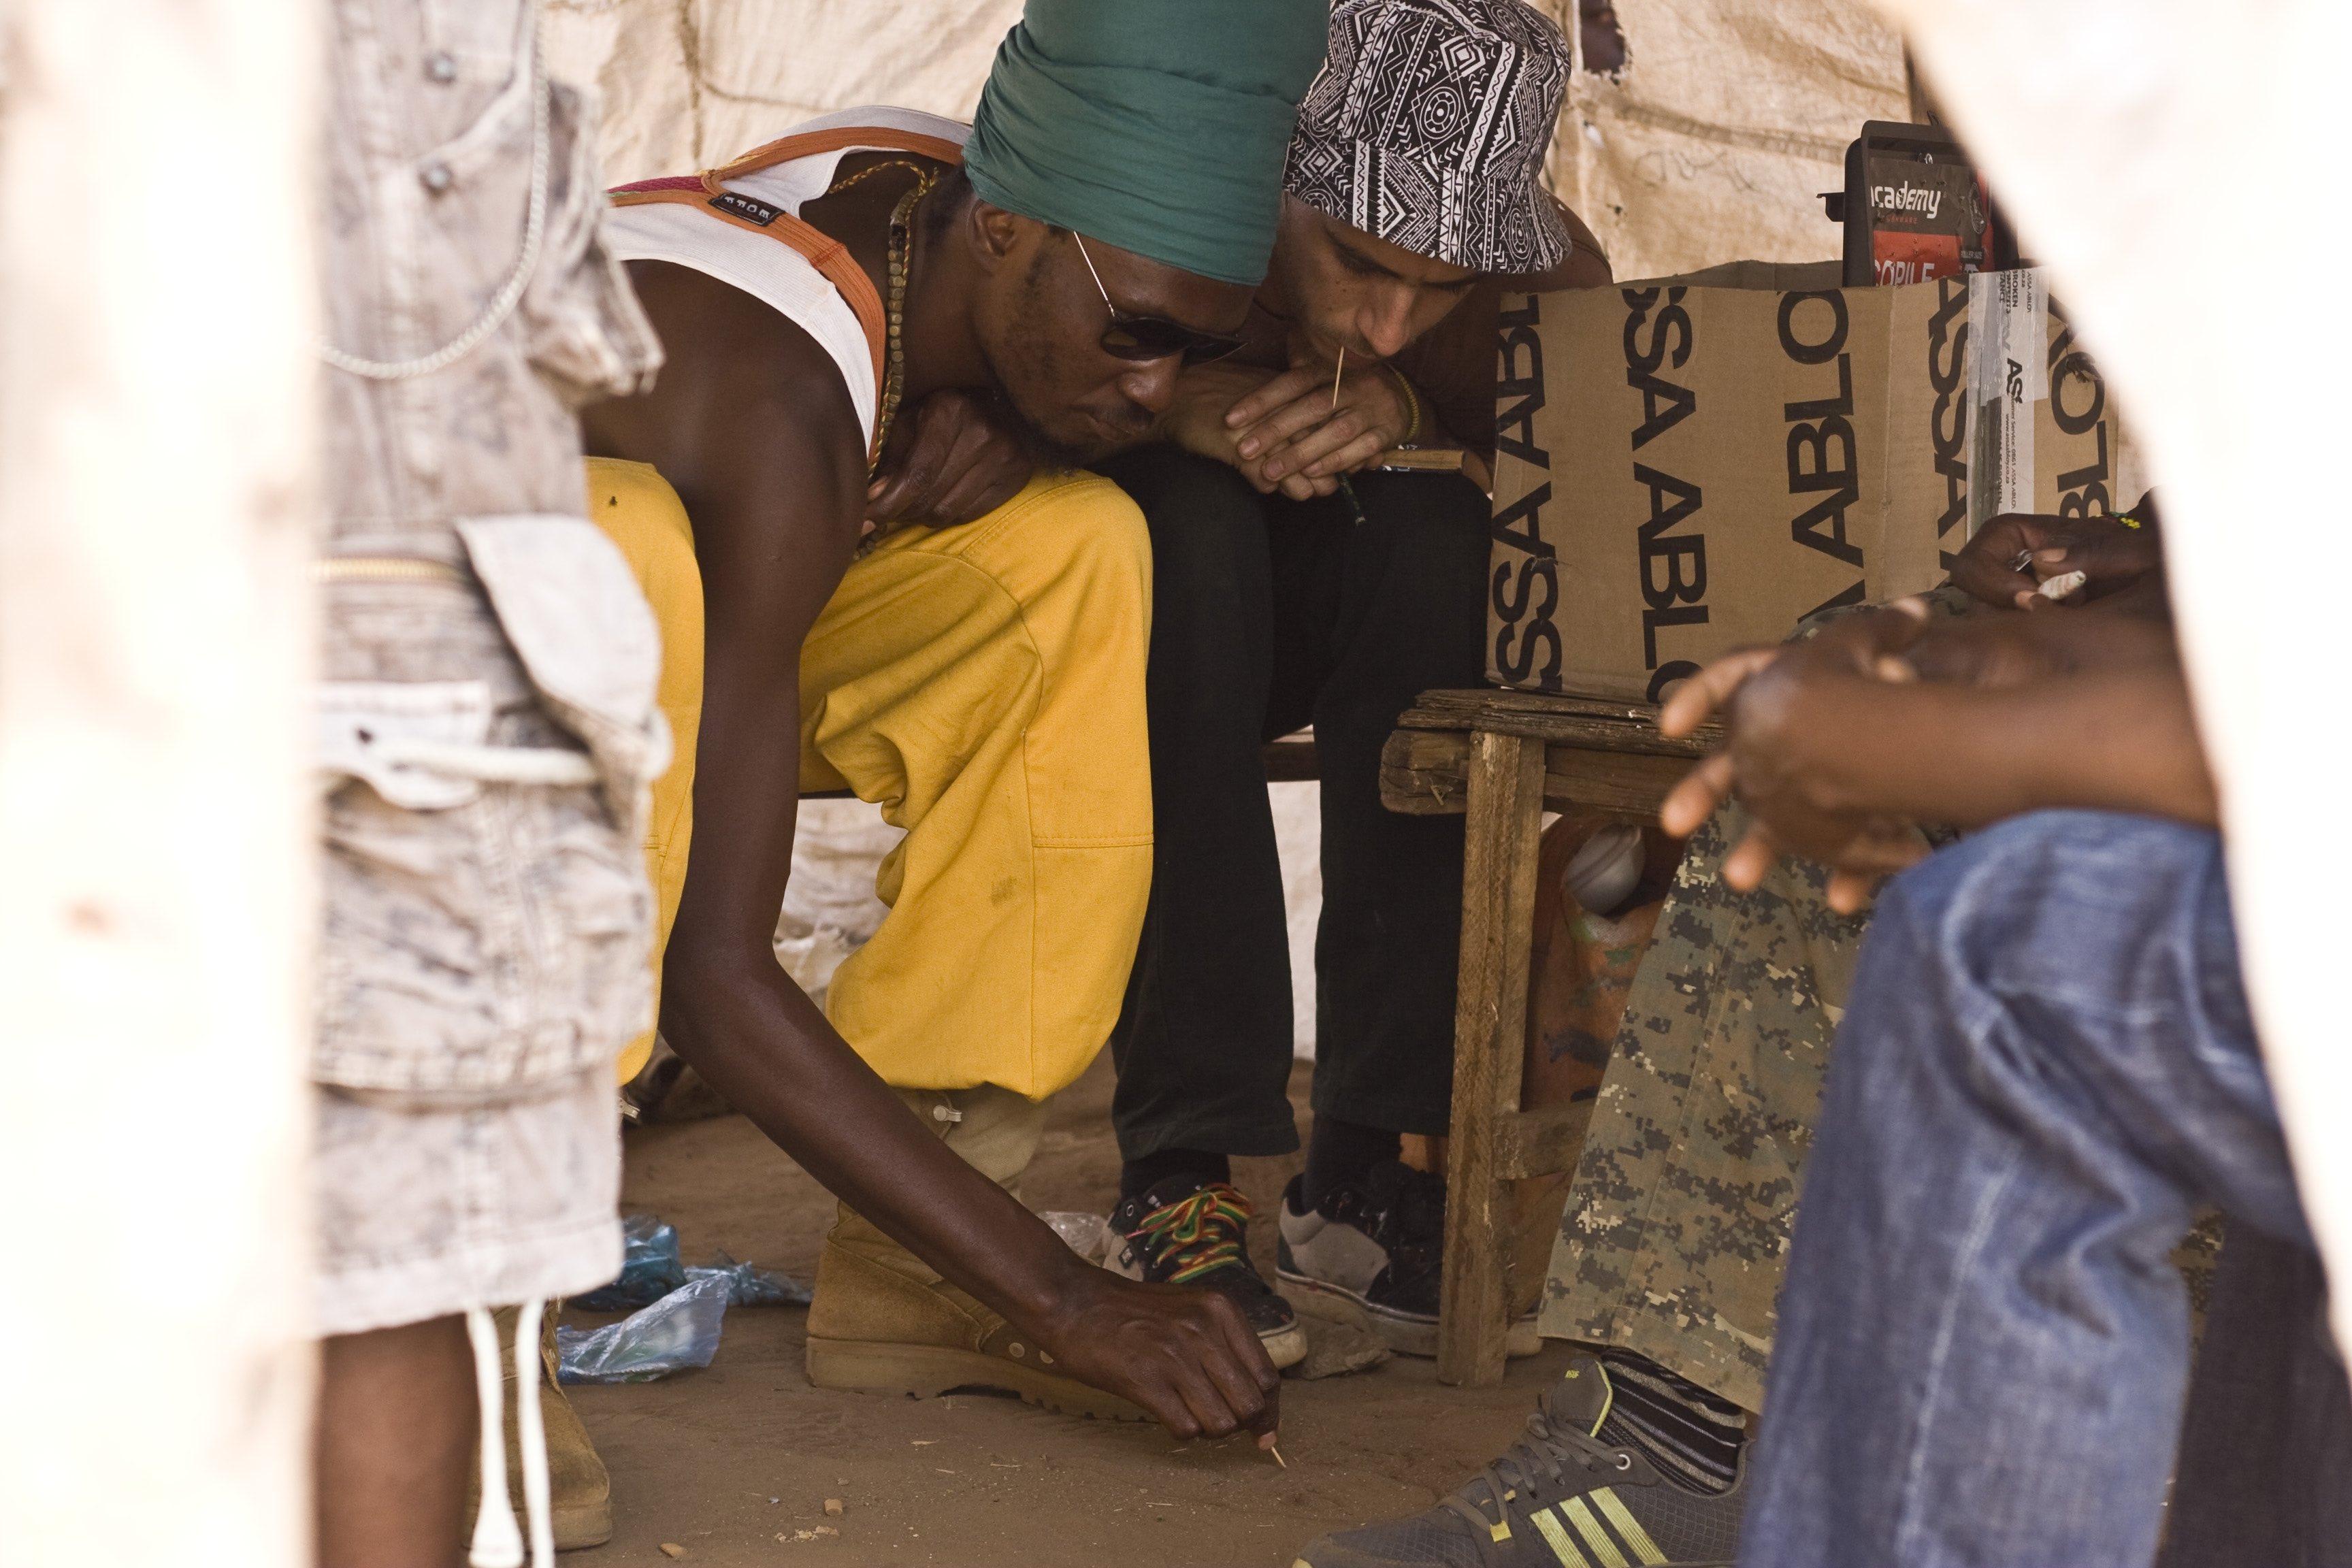 mook and raz planning in the sand_be happy barber shop_lilongwe tsoka market